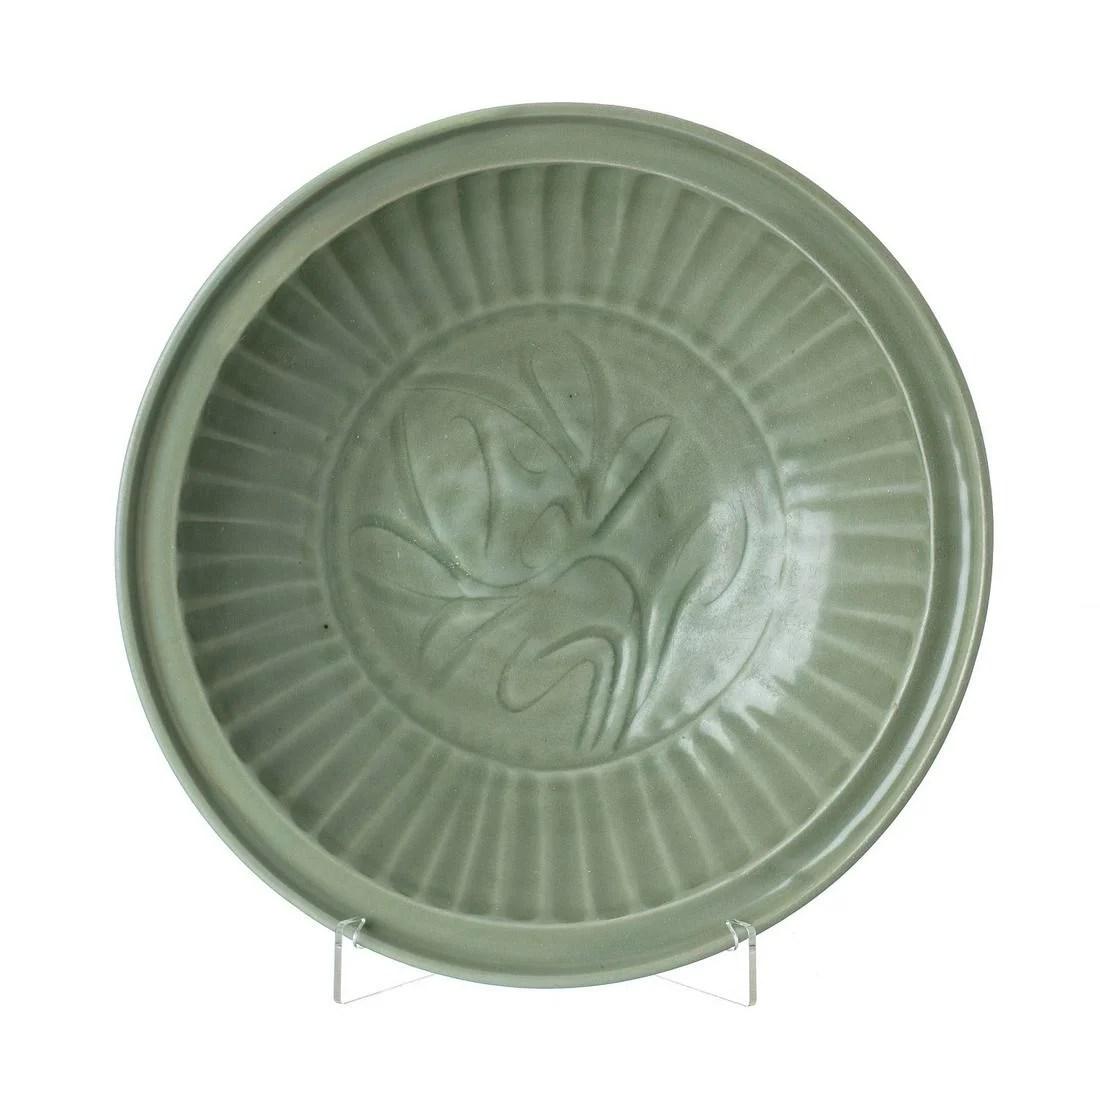 Longquan Celadon ceramic bowl, Ming